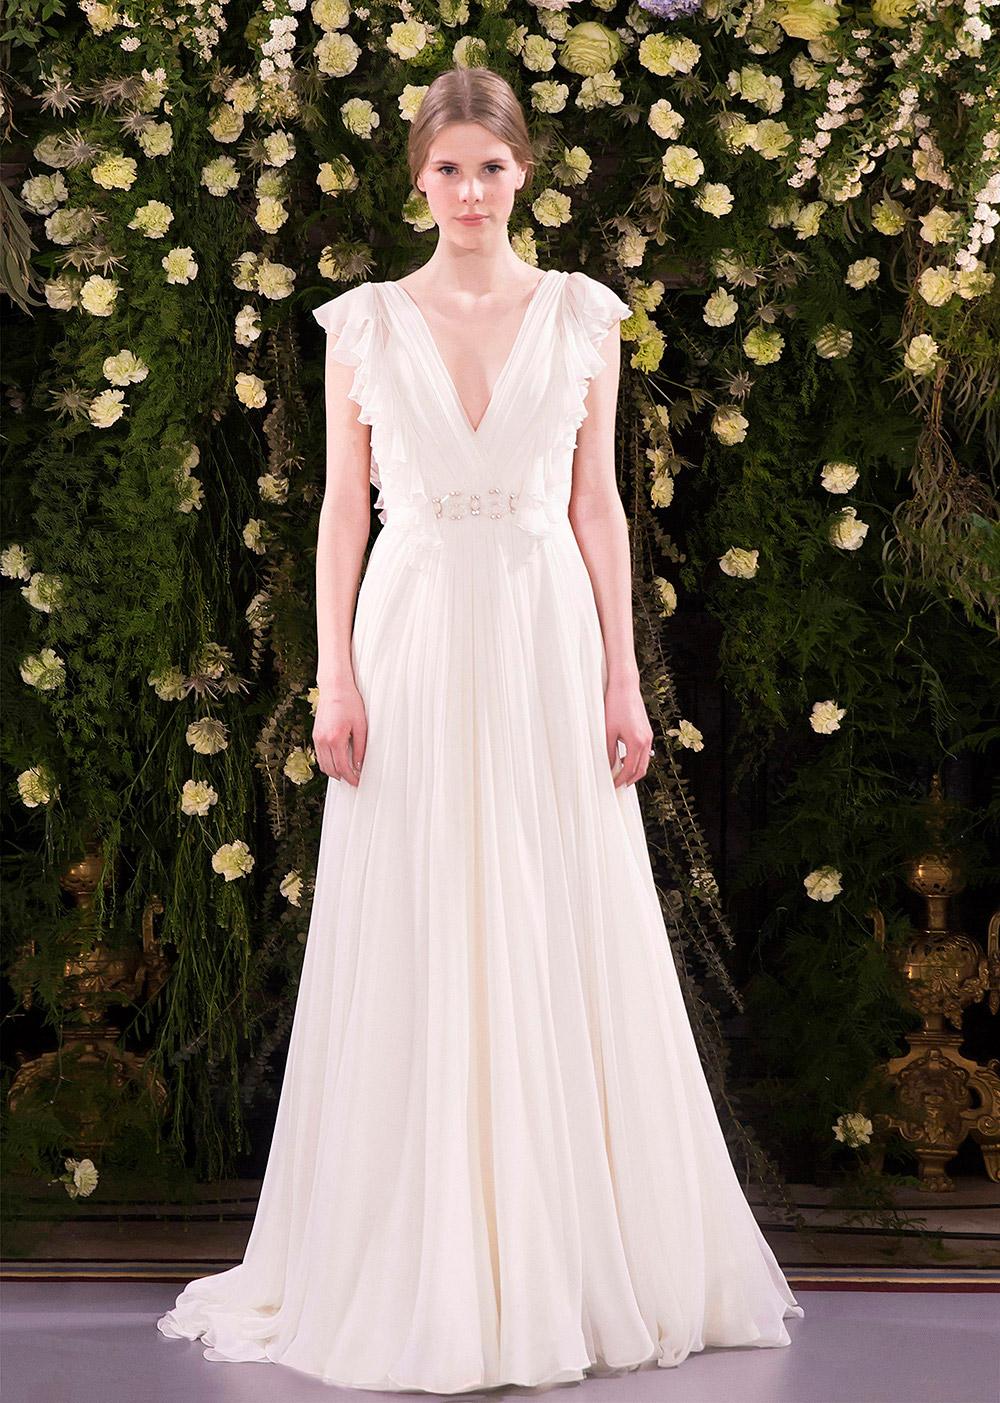 Julia – Jenny Packham 2019 Bridal Collection. www.theweddingnotebook.com